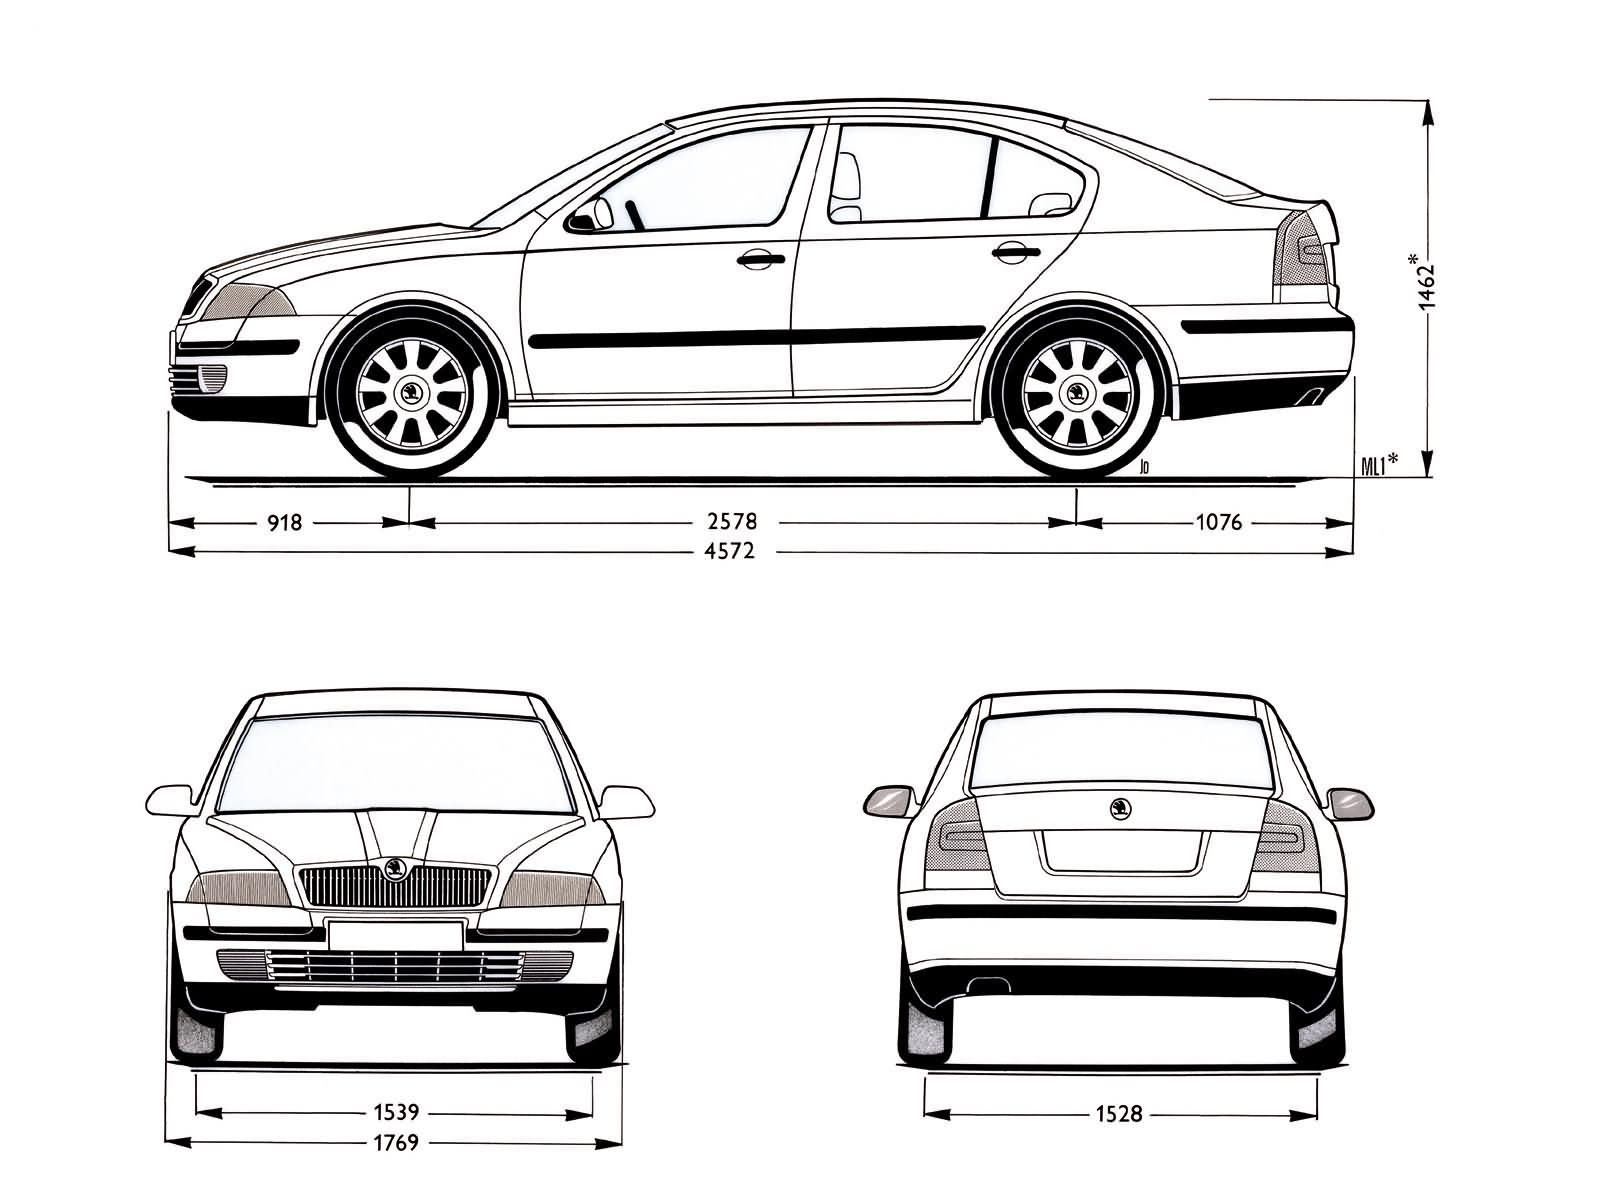 Skoda Octavia blueprint